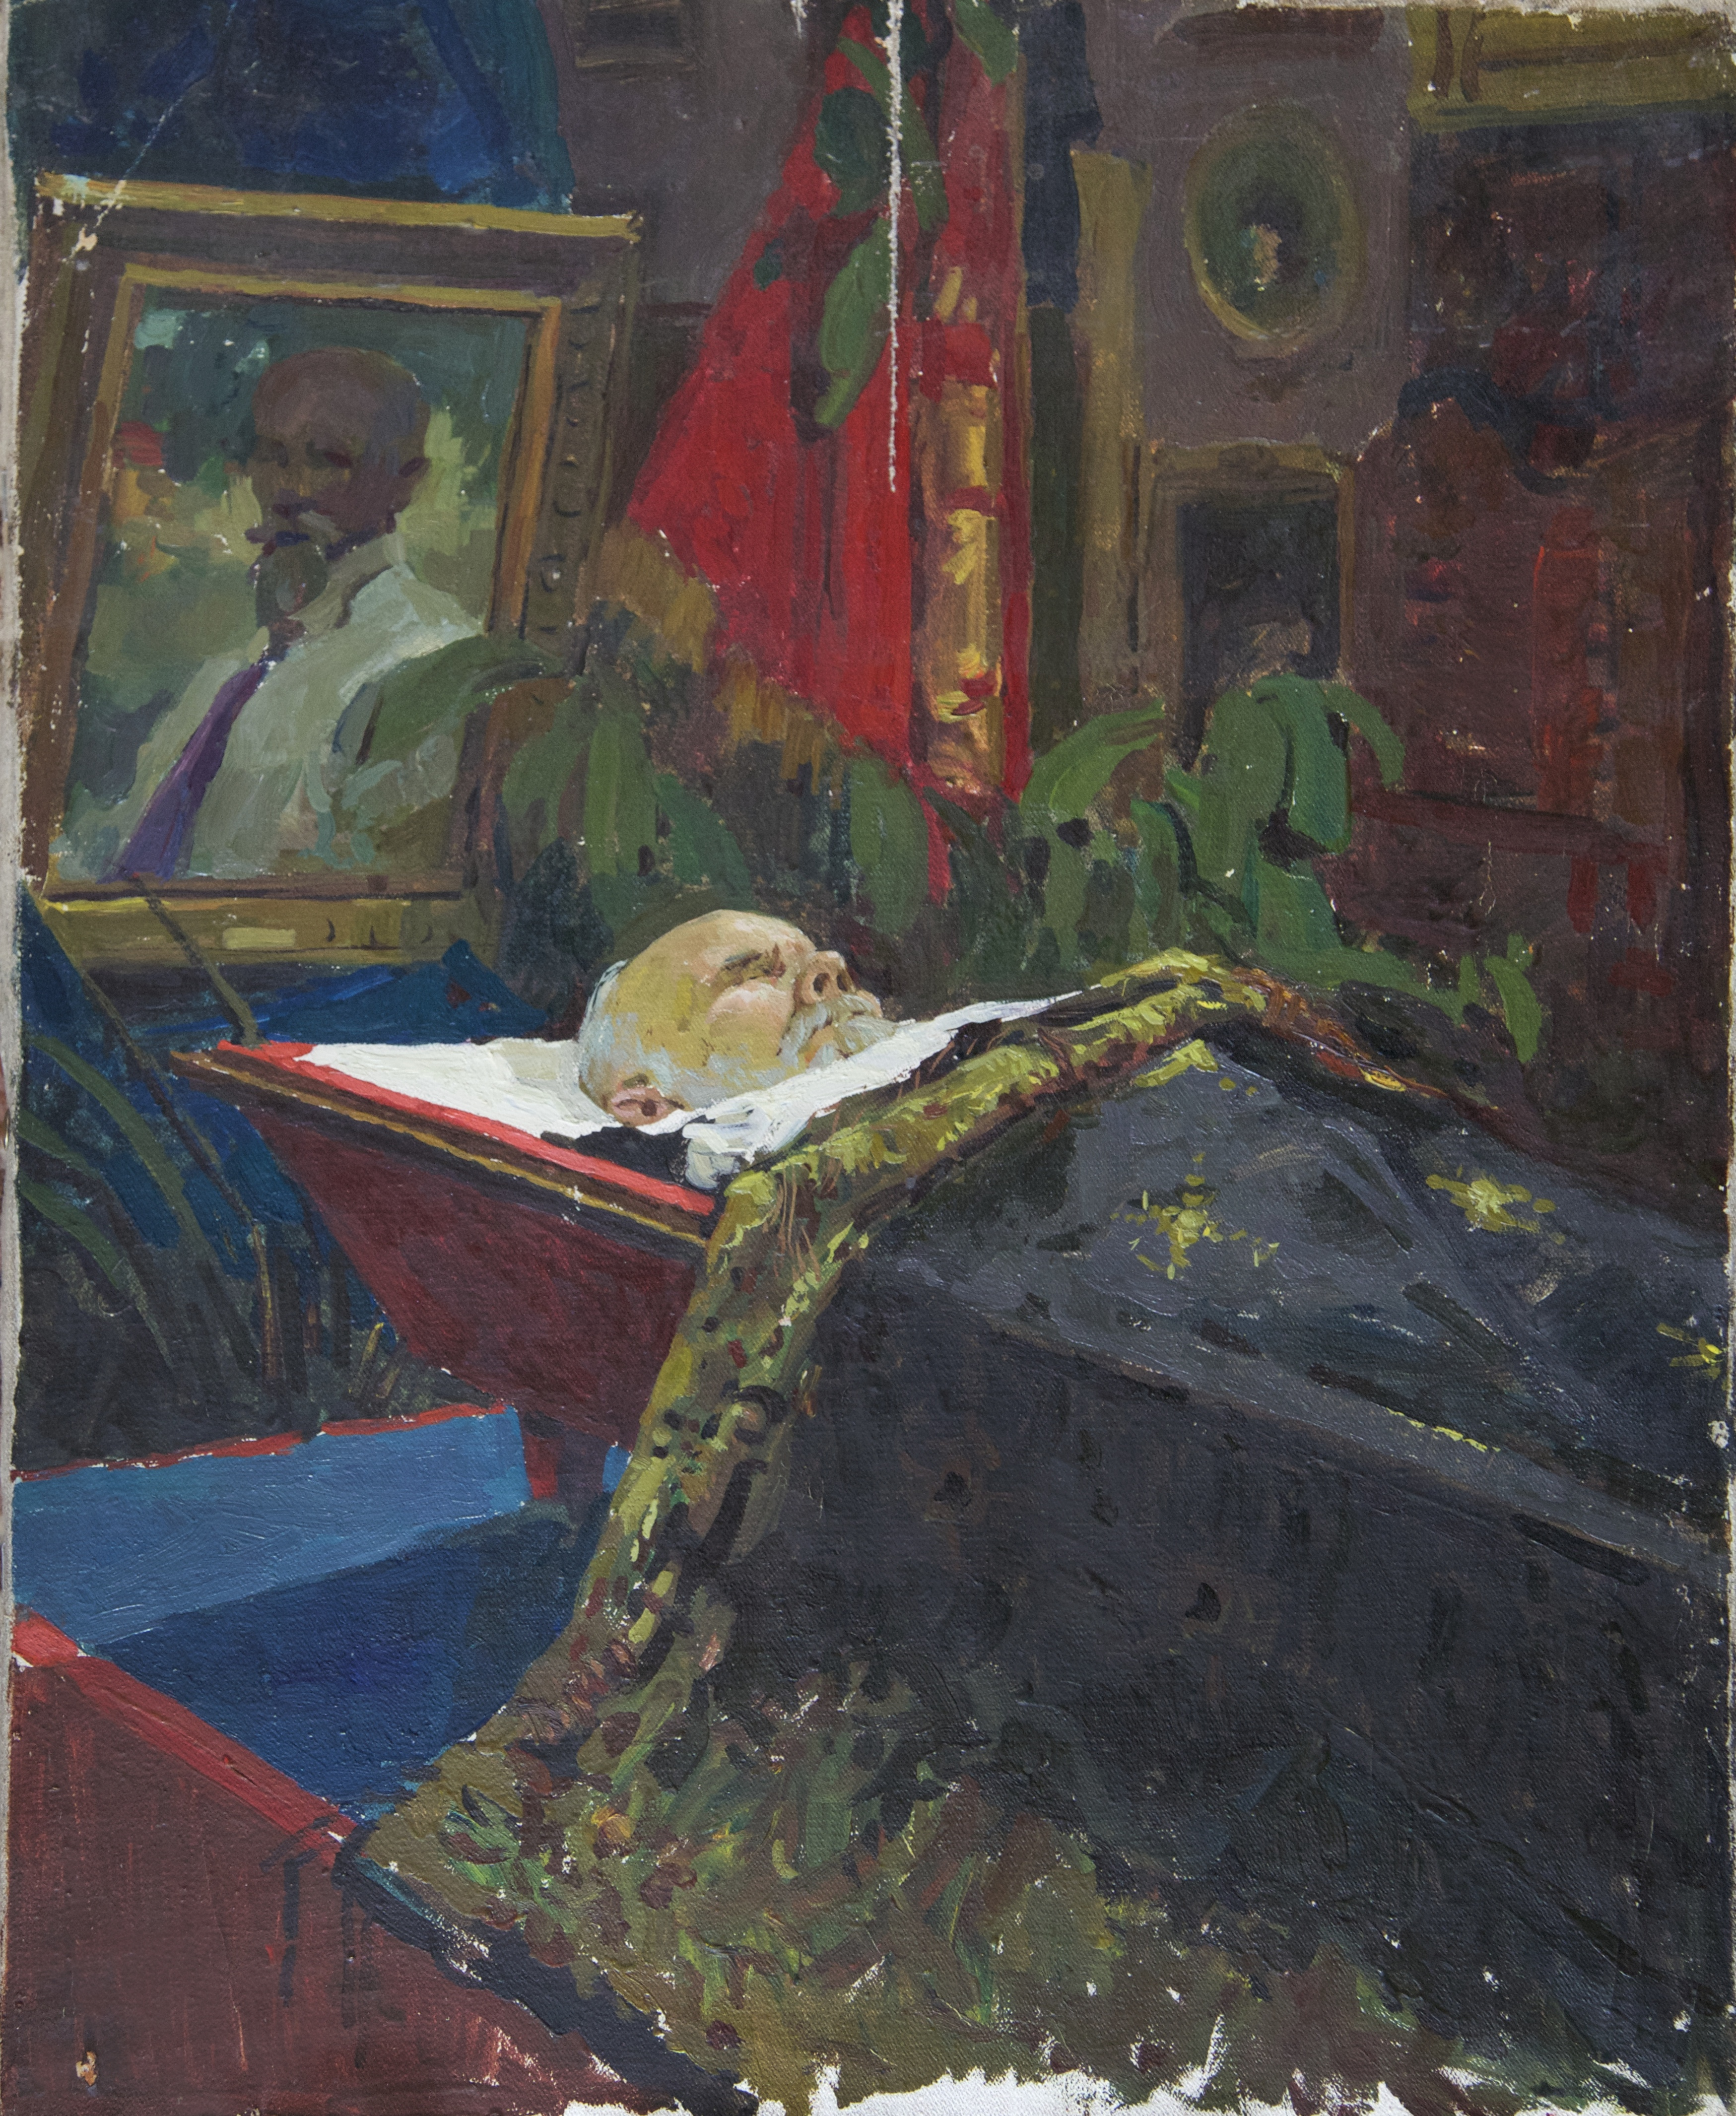 Ivan Gorushkin-Sorokopudov